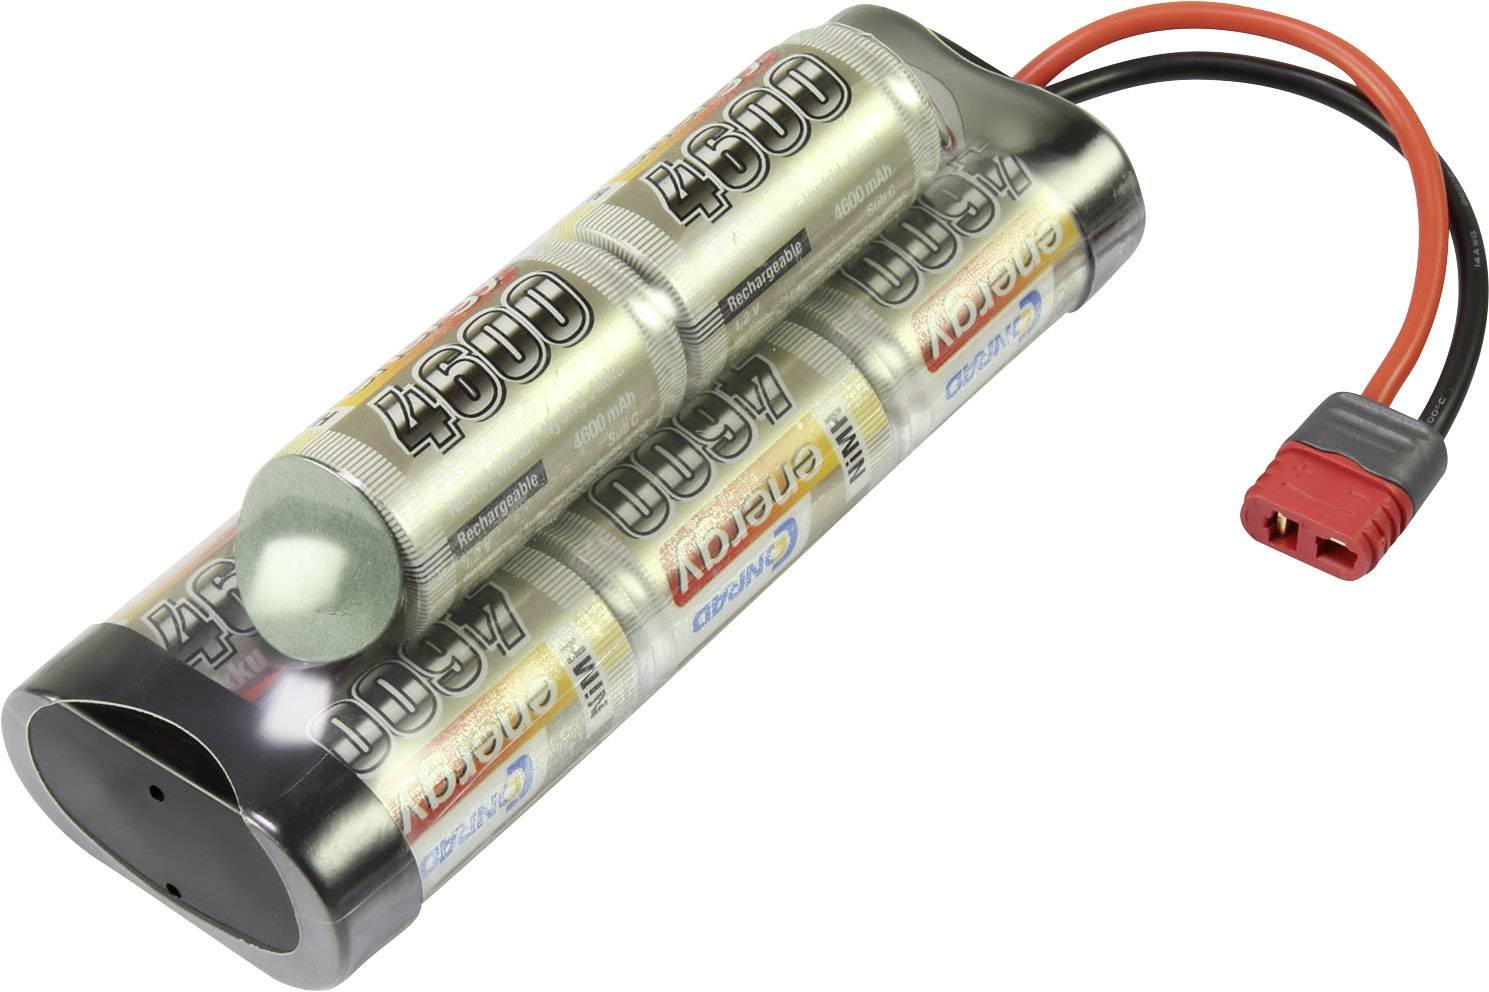 Batteria ricaricabile NiMh 9.6 V 4600 mAh Conrad energy Hump Spina a T